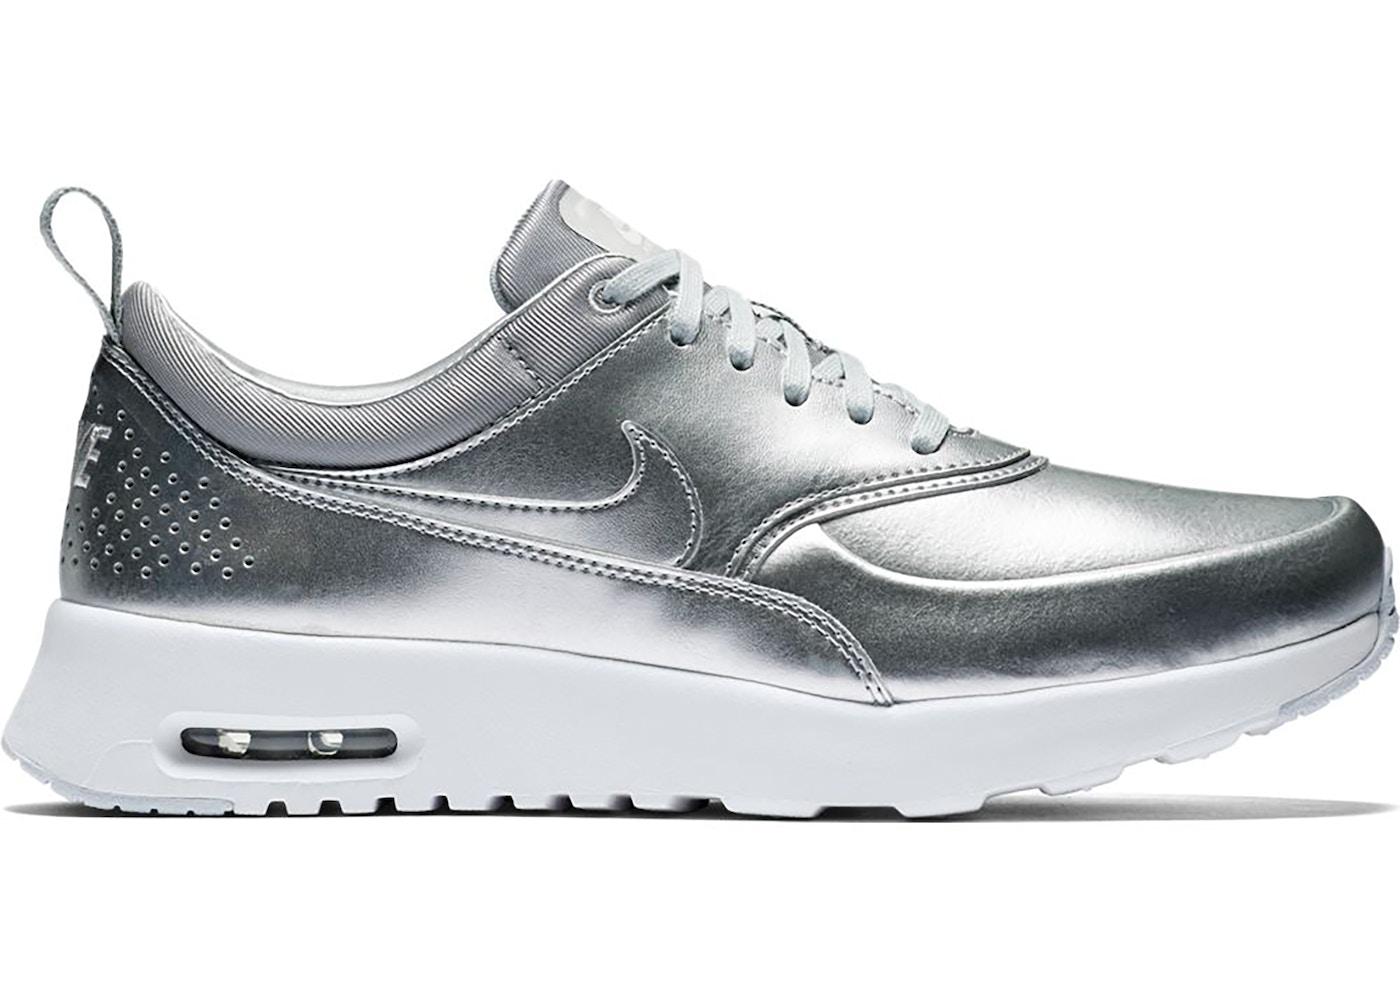 Plata Melbourne sangrado  Nike Air Max Thea Metallic Silver (W) - 819640-001